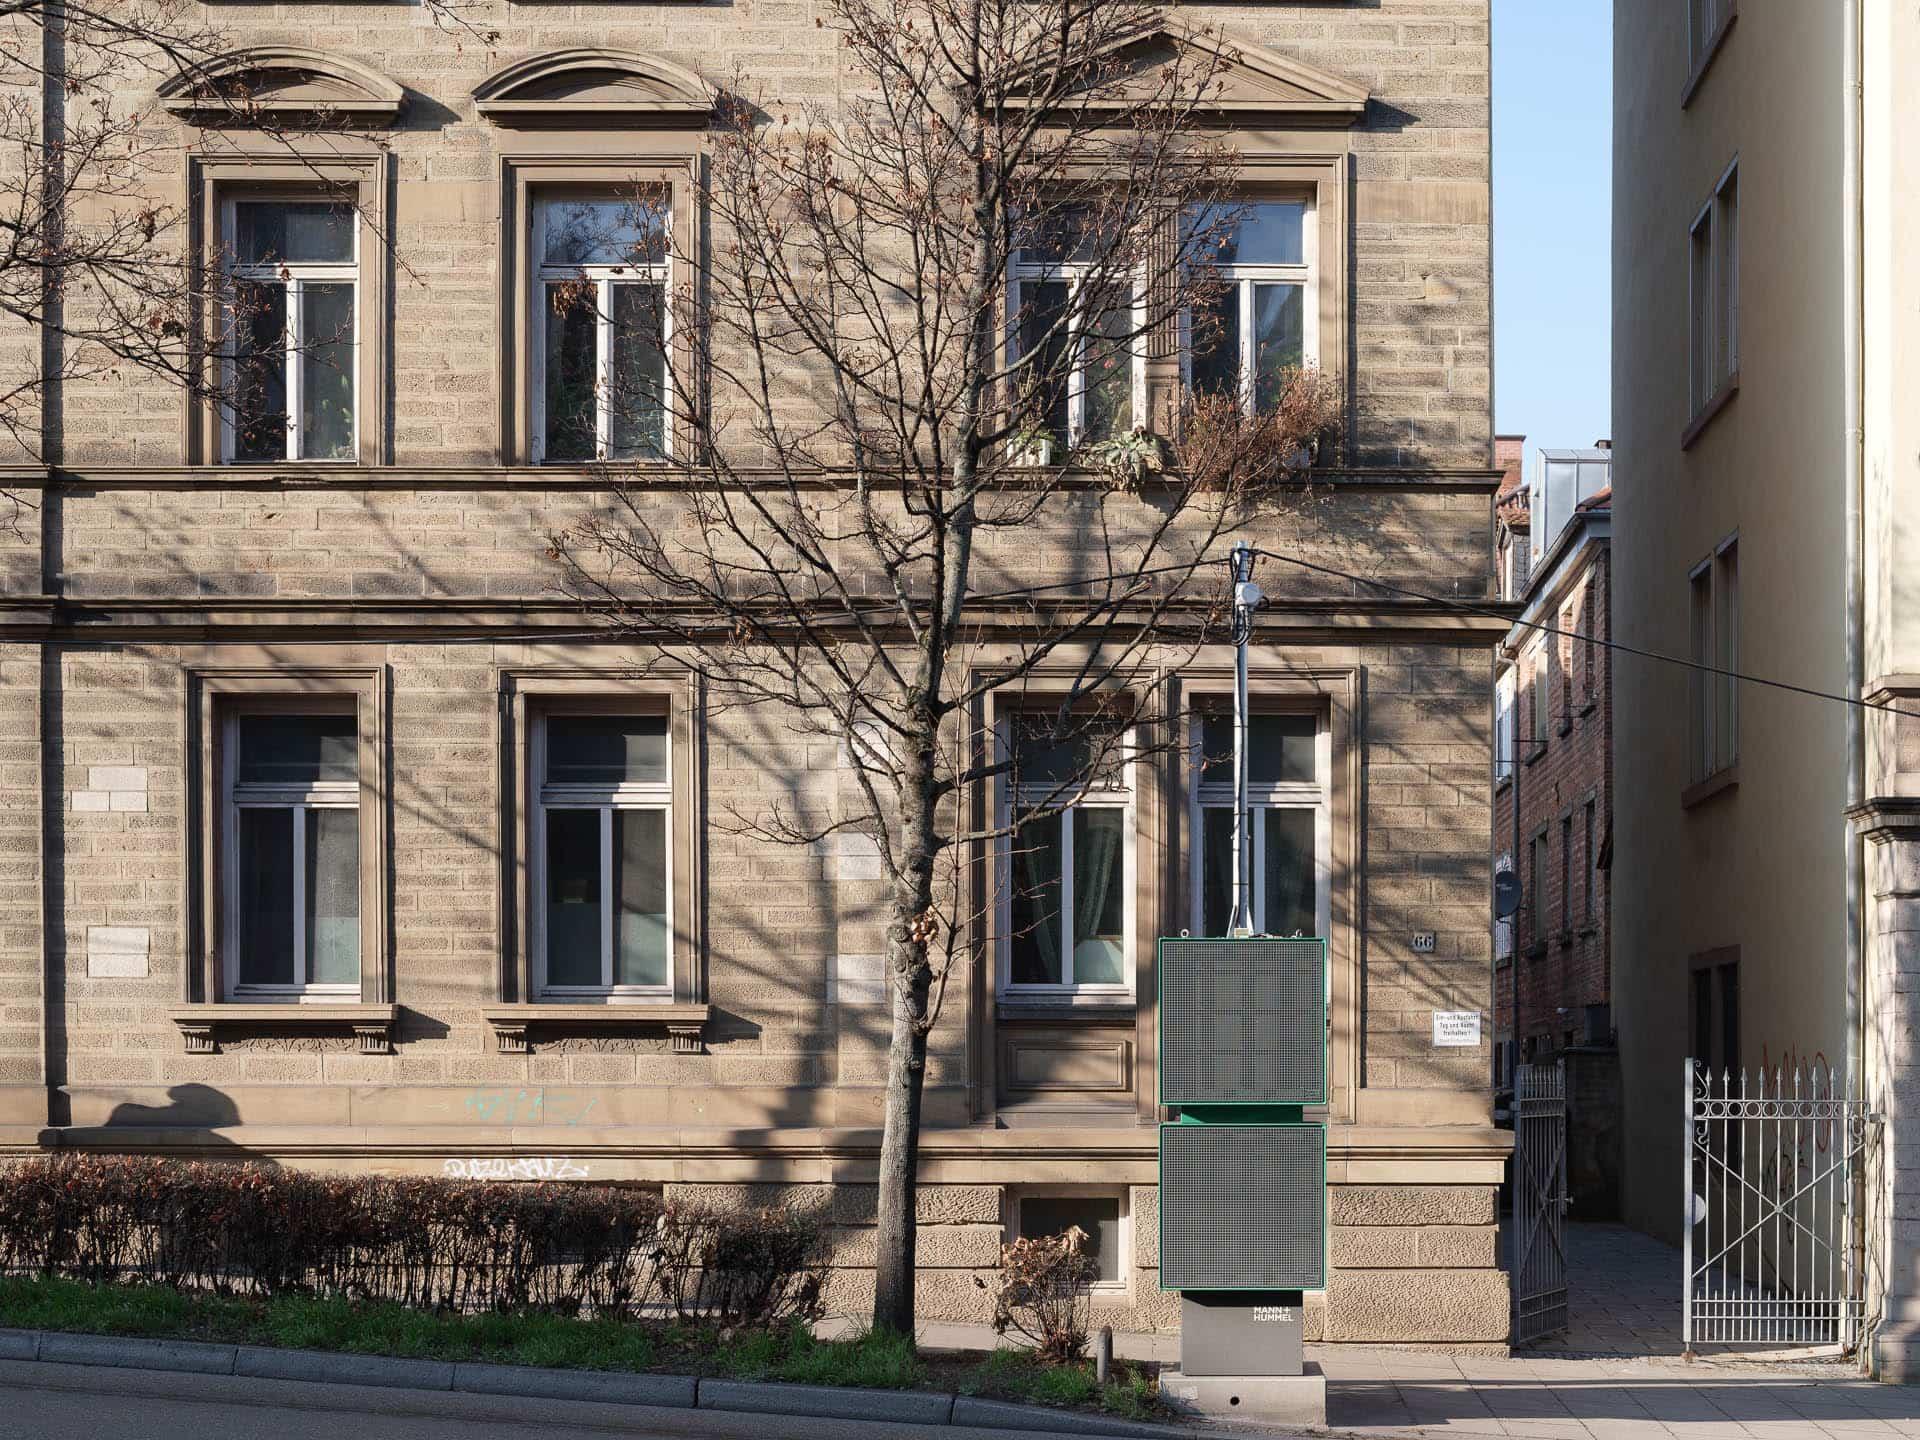 Bundesstraße, Hohenheimer Straße Stuttgart, Architektur, Feinstaubfilter, Filtersäulen